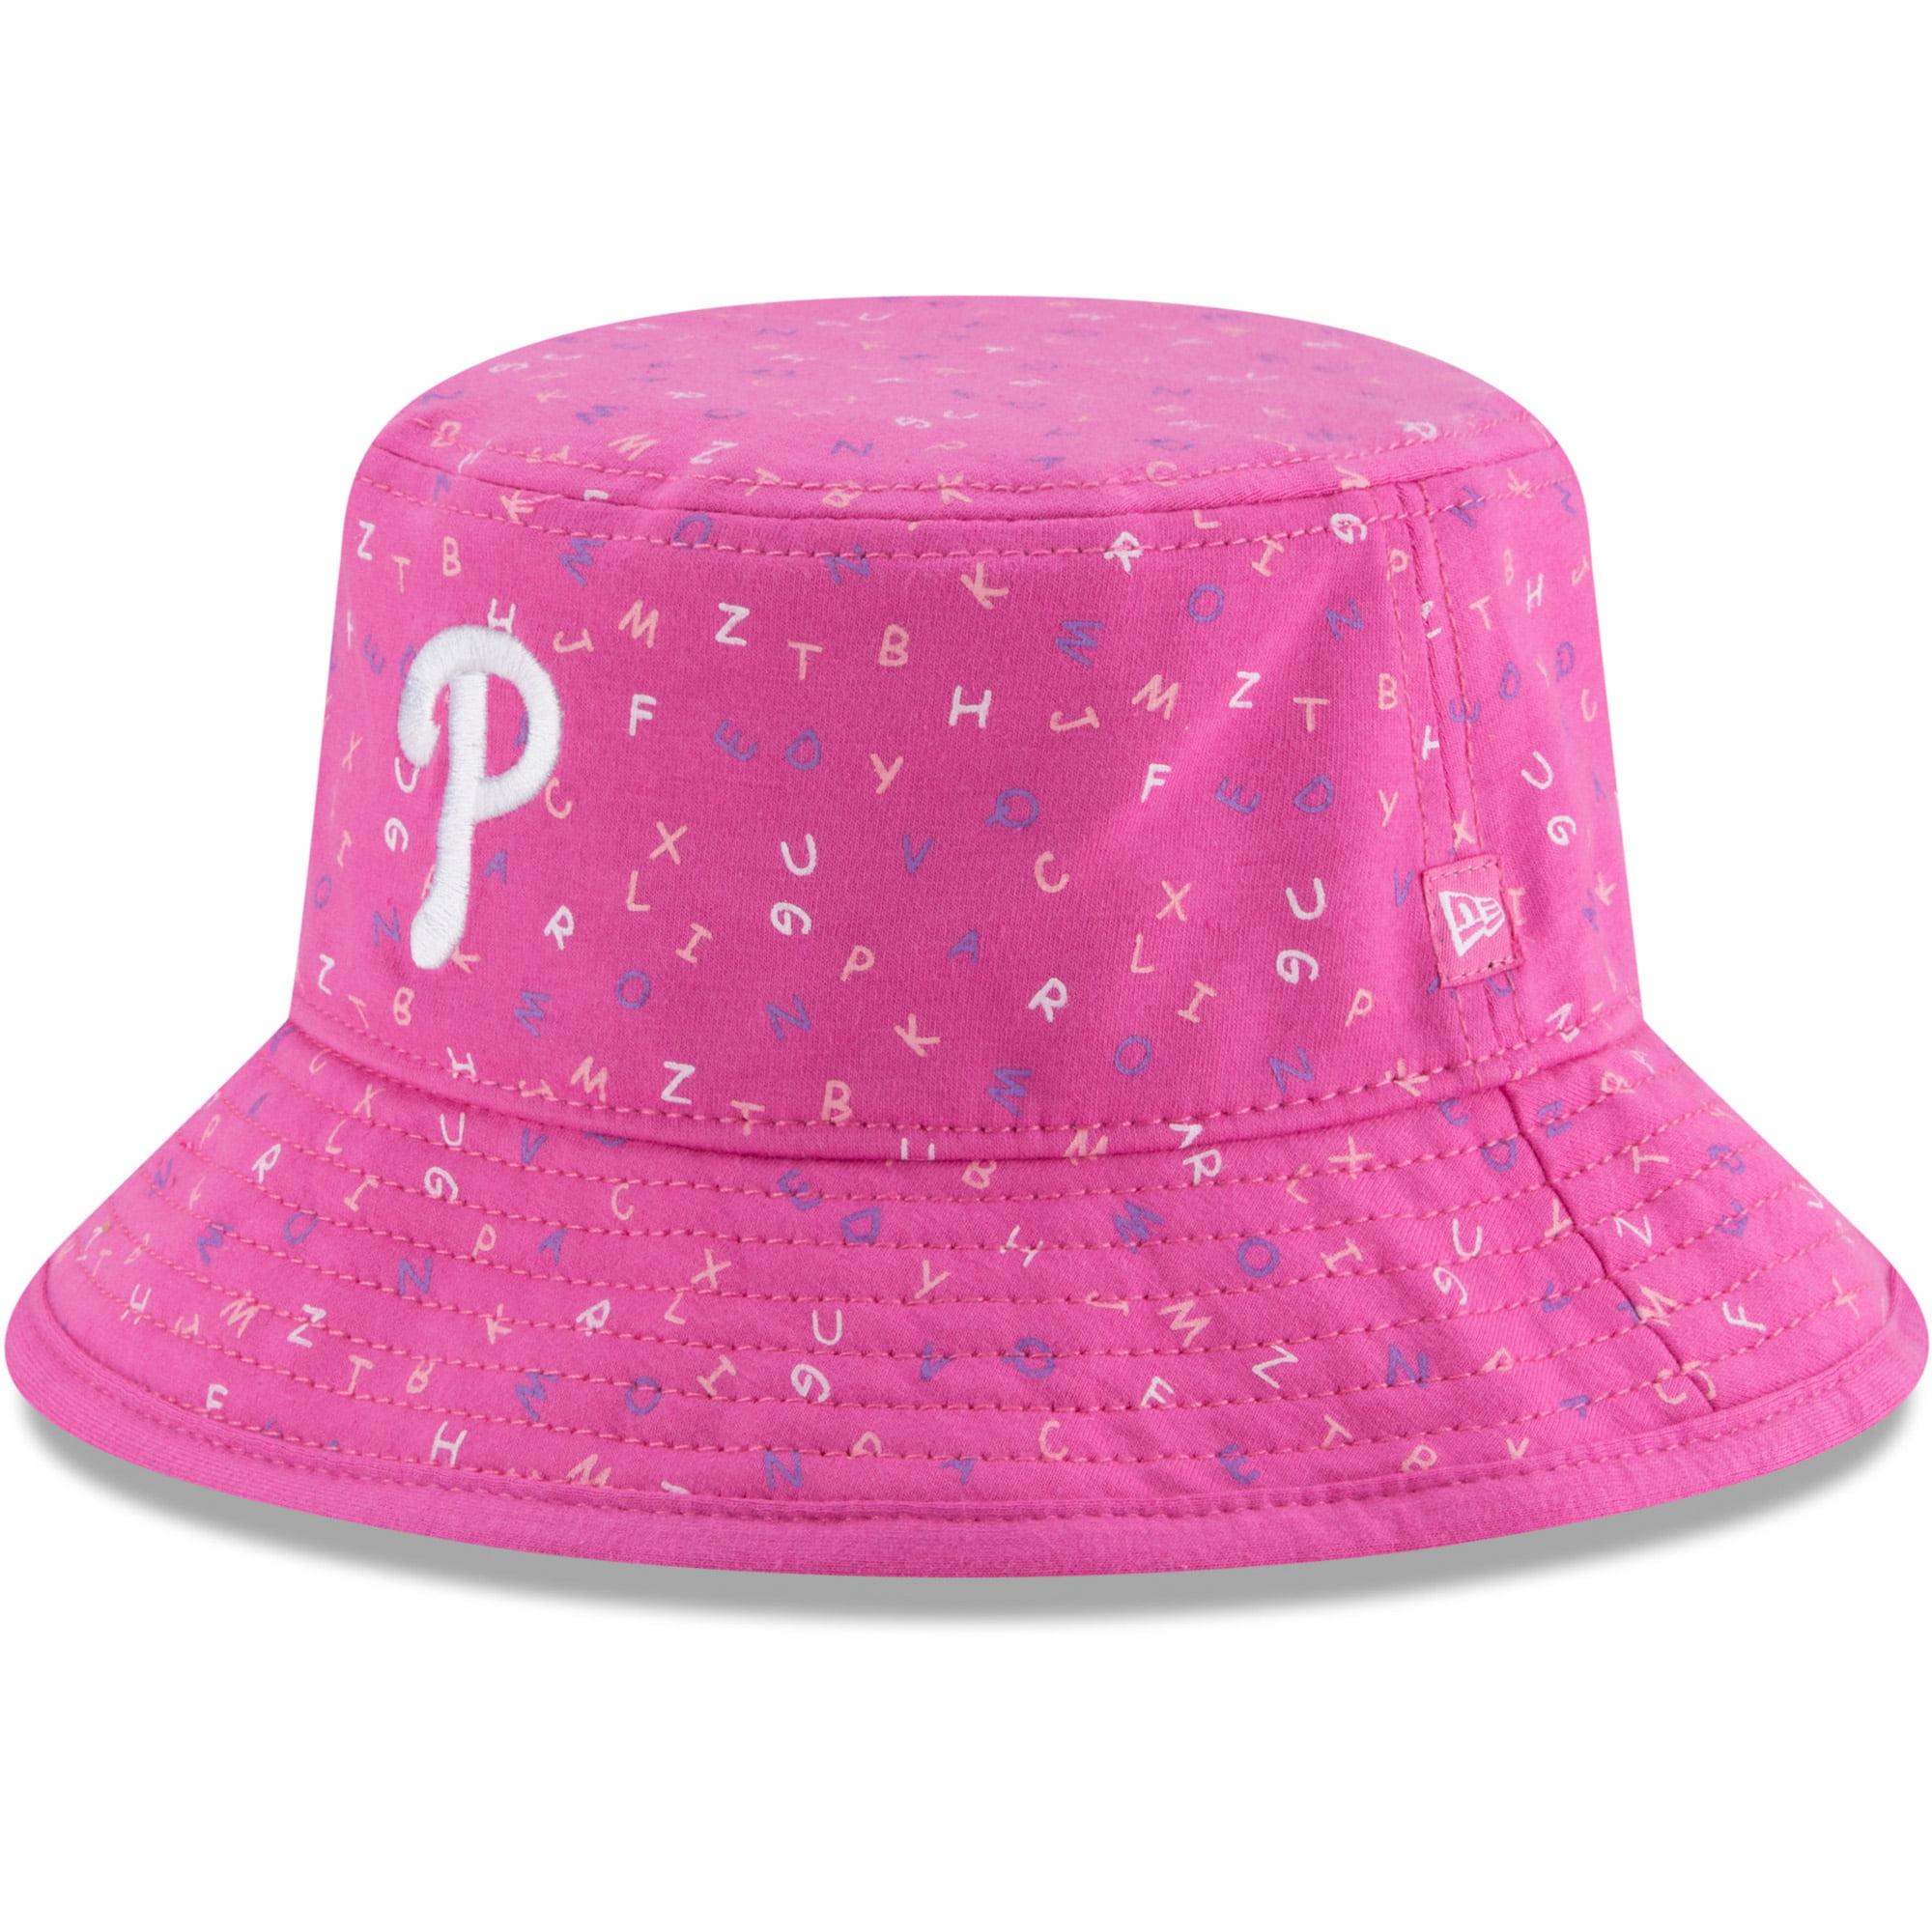 Philadelphia Phillies New Era Infant Alphabet Bucket Hat - Pink - OSFA